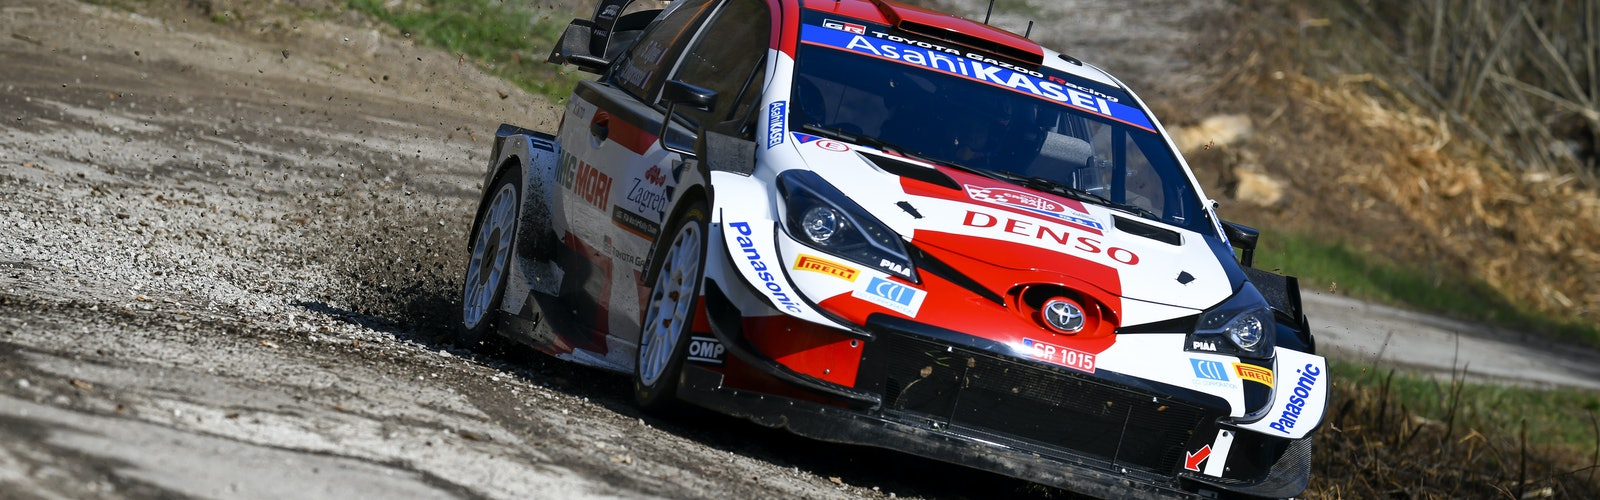 WRC_2021_Rd.3_220